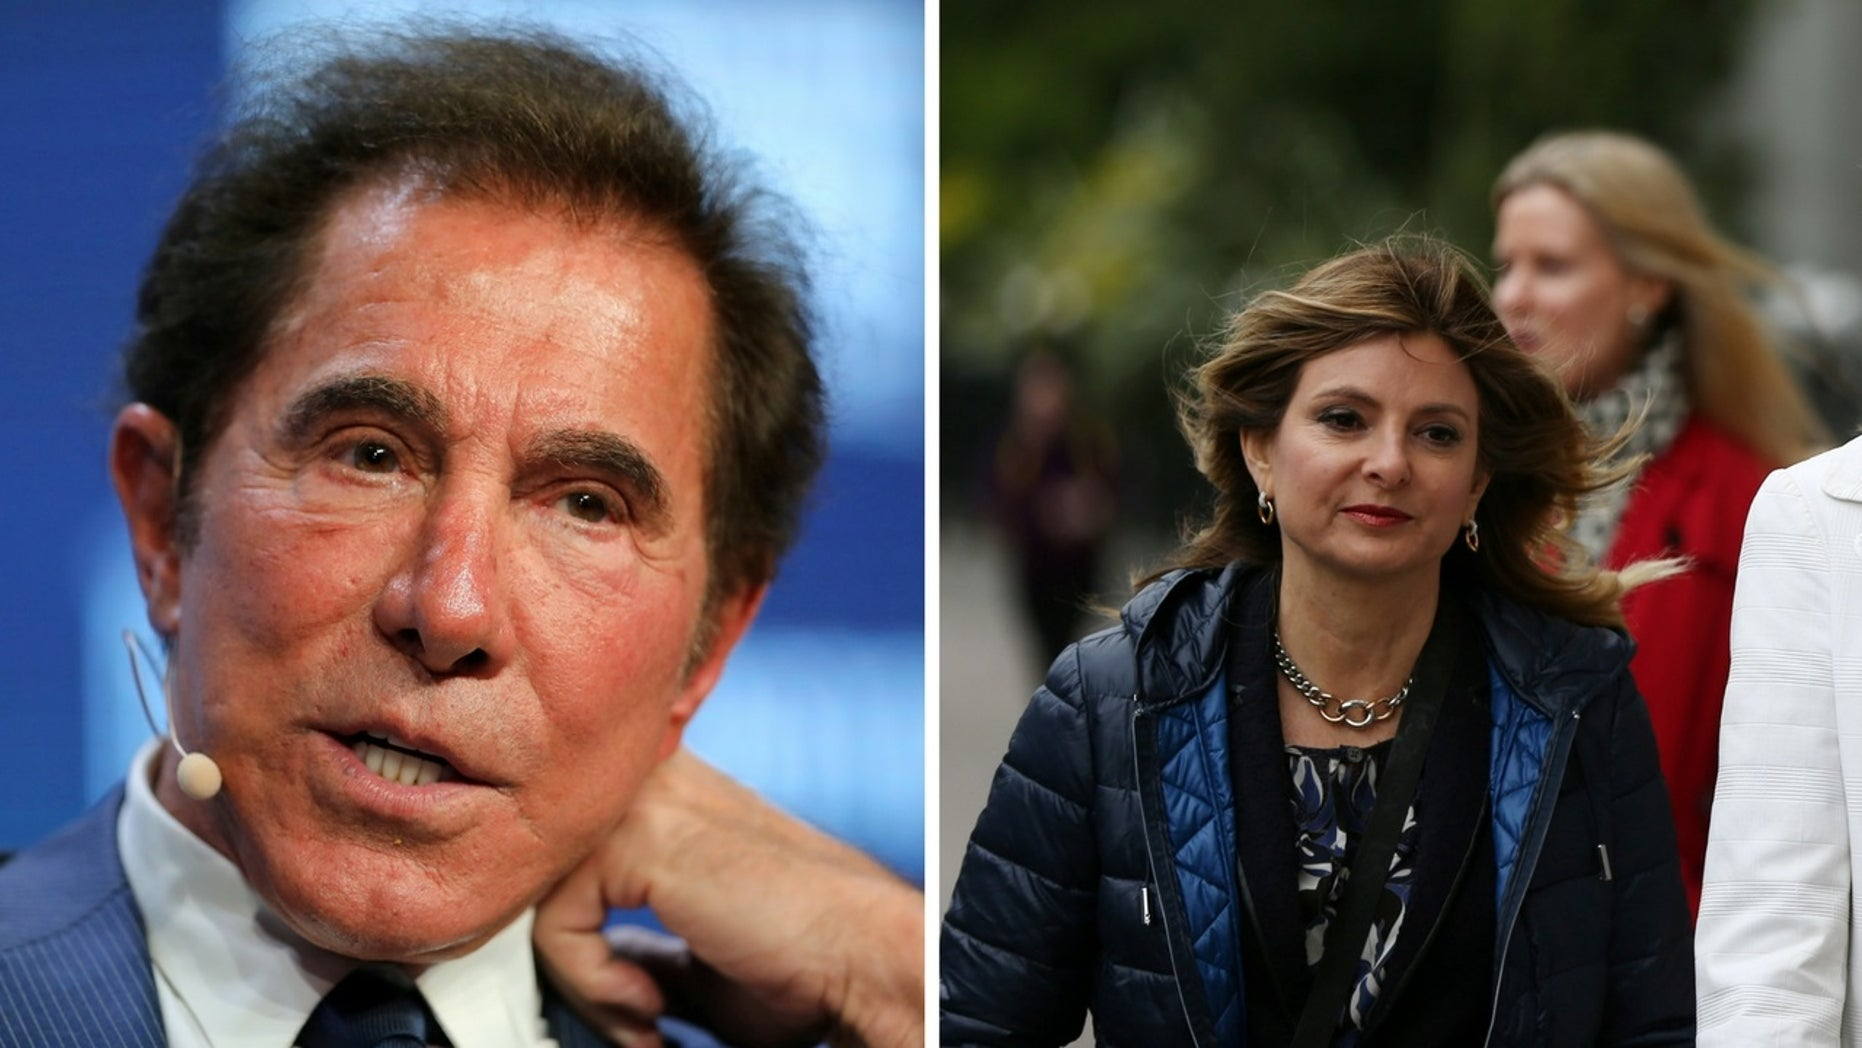 Embattled casino mogul Steve Wynn has sued high-profile lawyer Lisa Bloom for defamation.